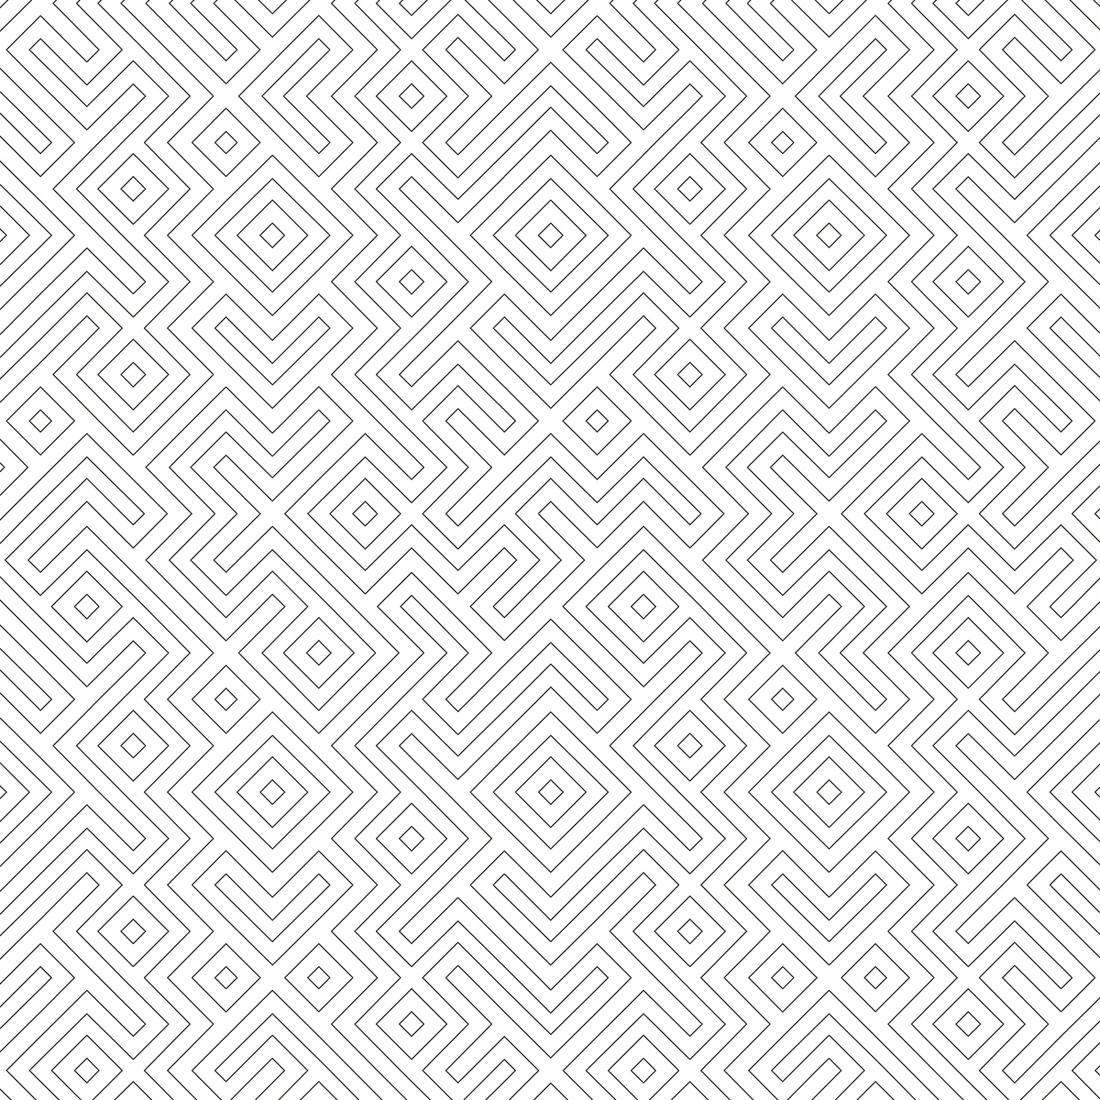 K219 Labyrinth SU (Splashback HPL sample)